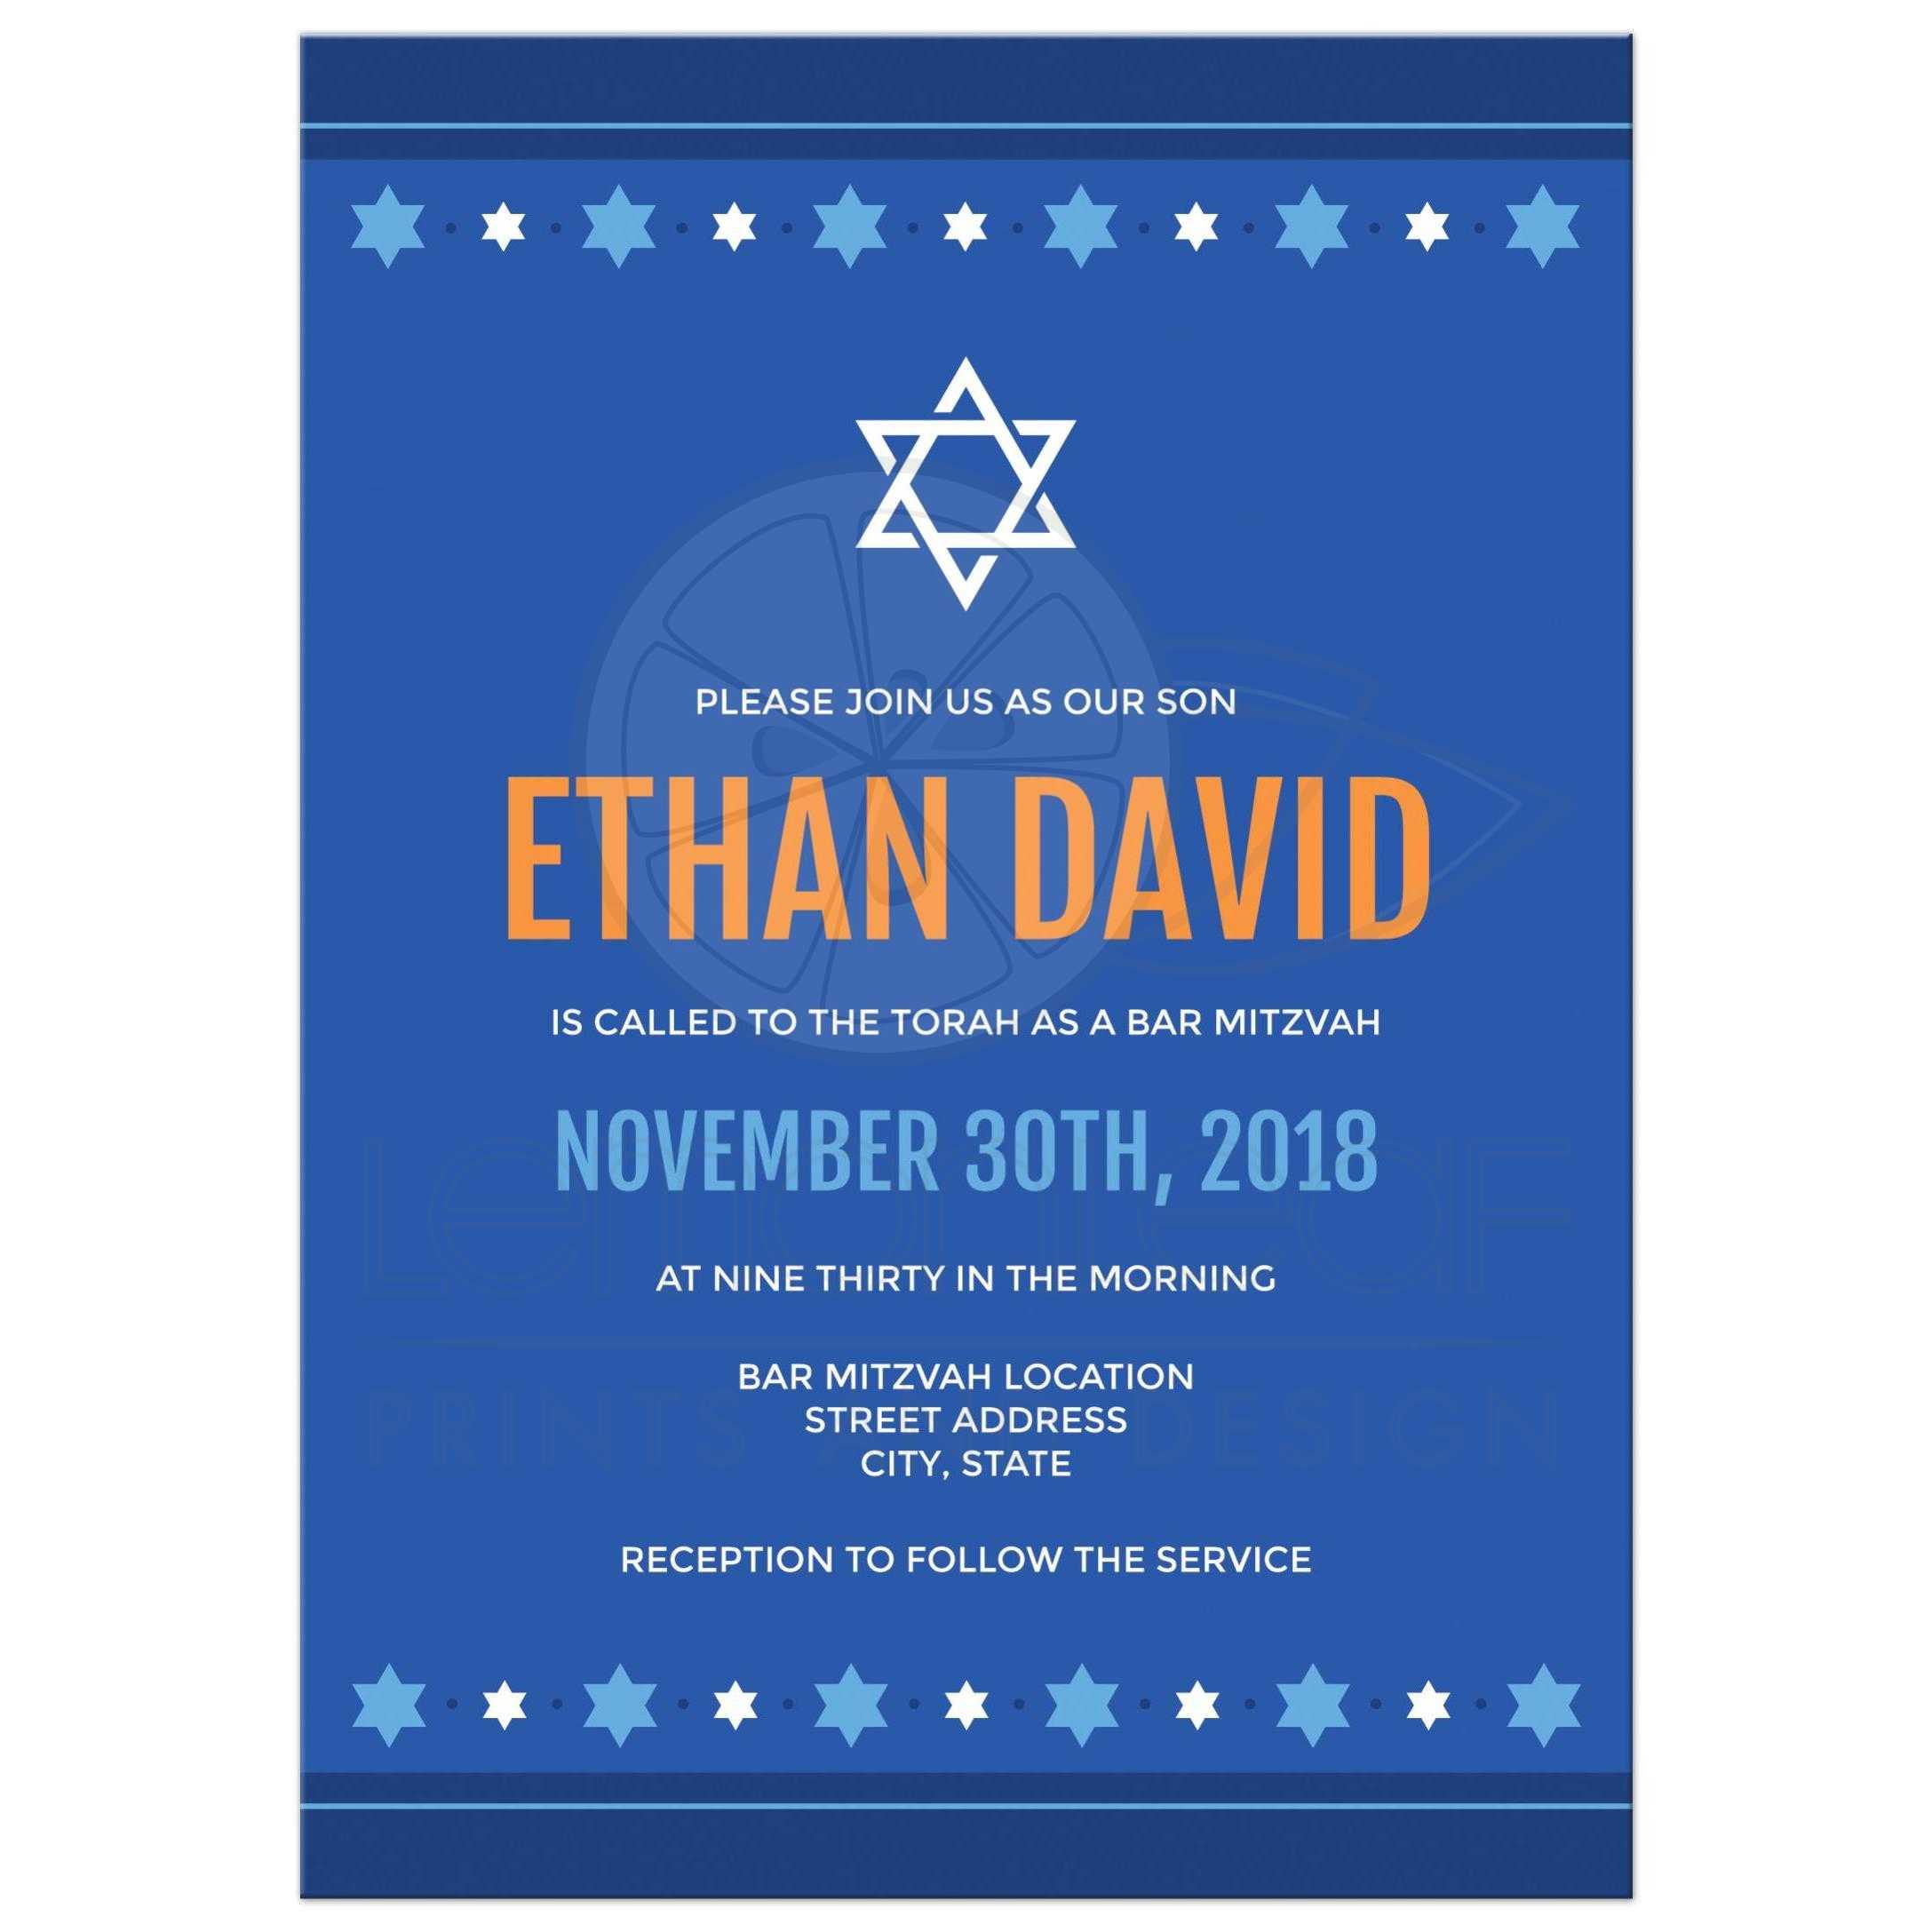 Blue bar mitzvah invitations with Star of David border